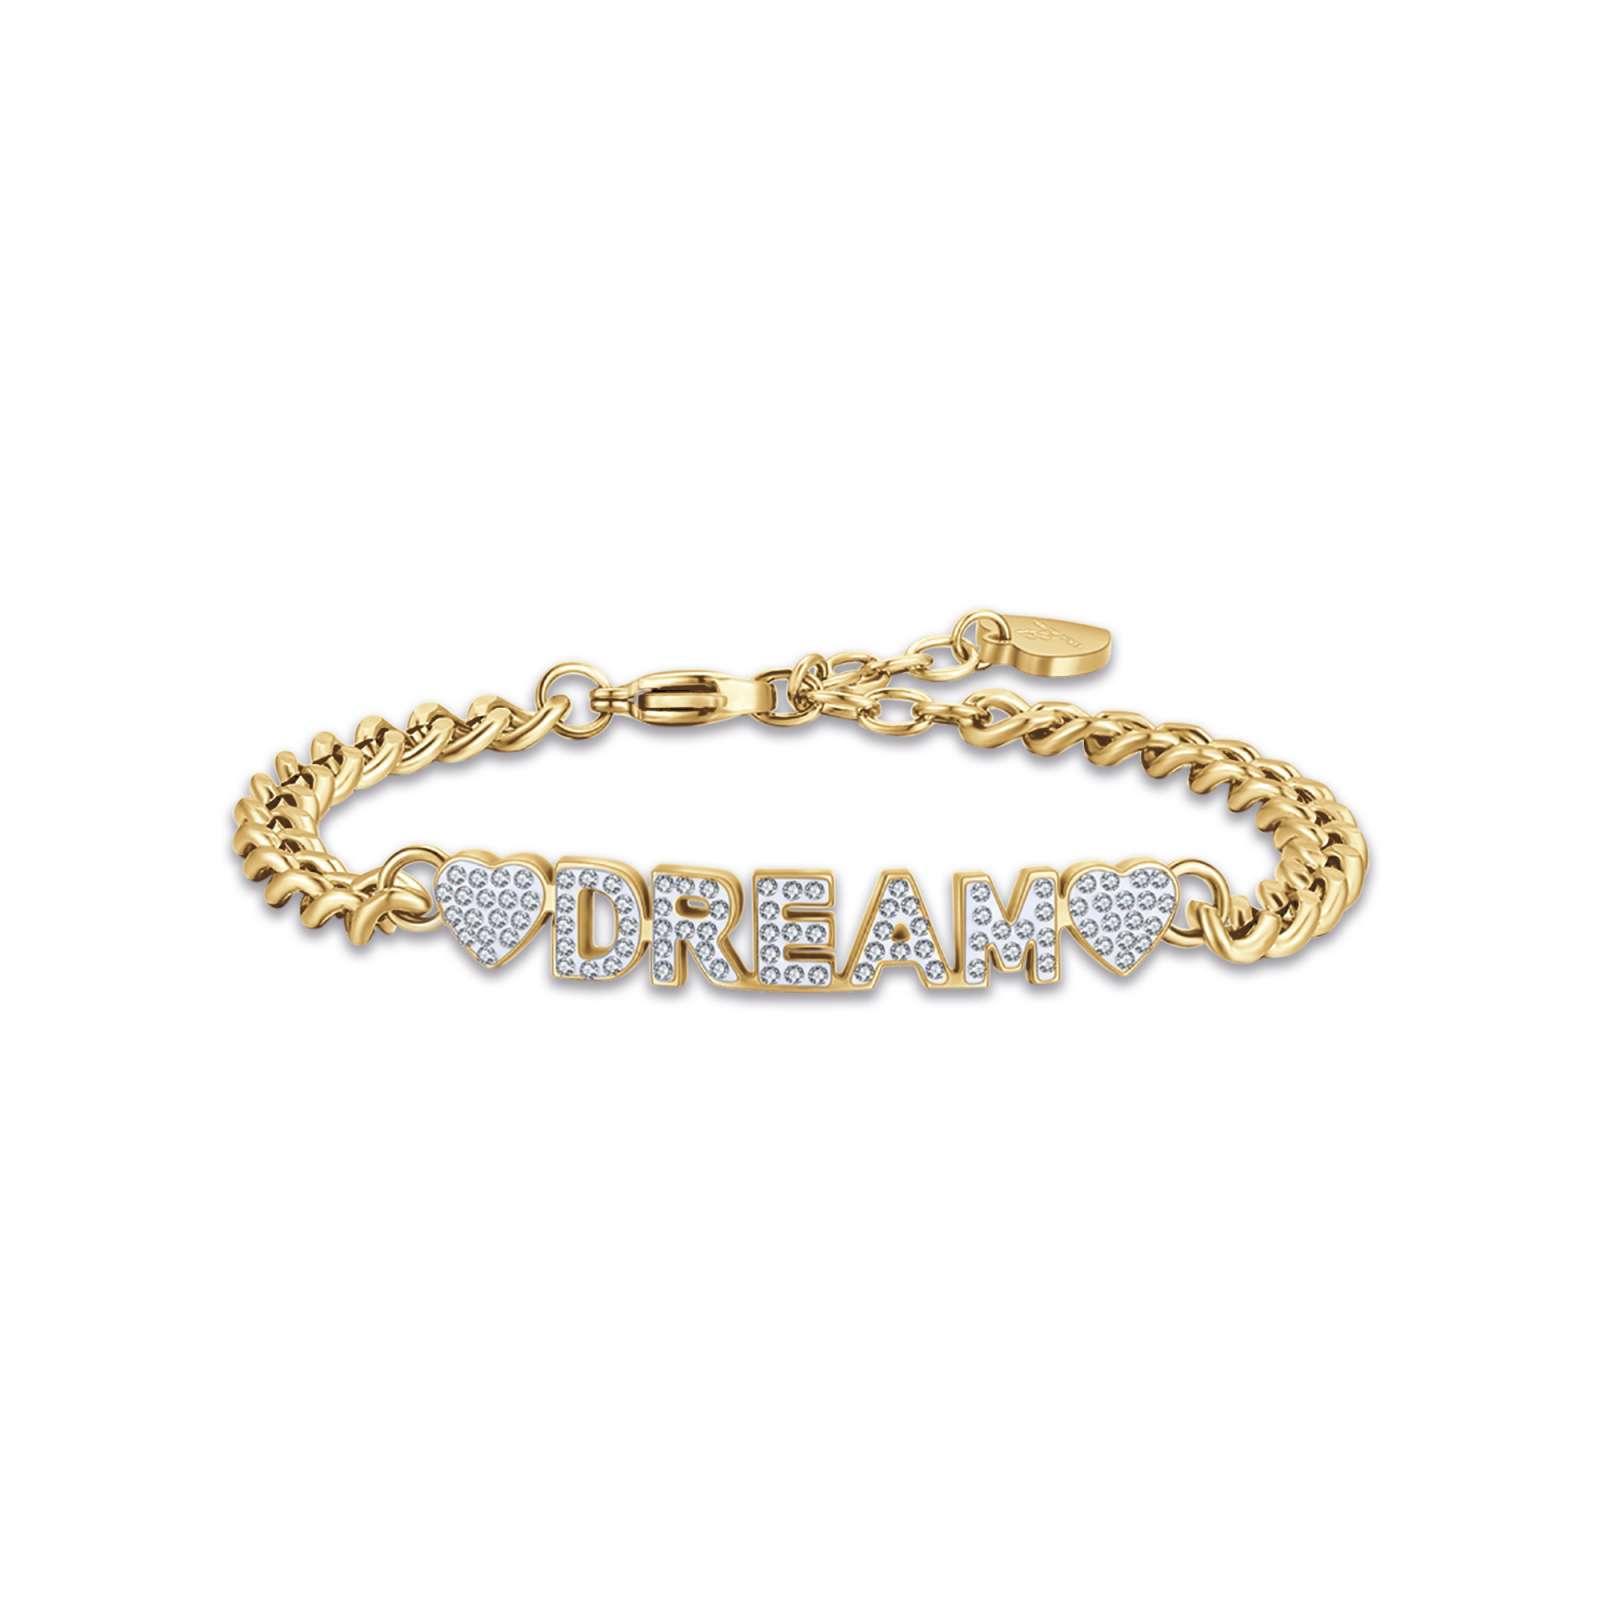 Luca Barra - Bracciale in acciaio gold dream con cristalli bianchi